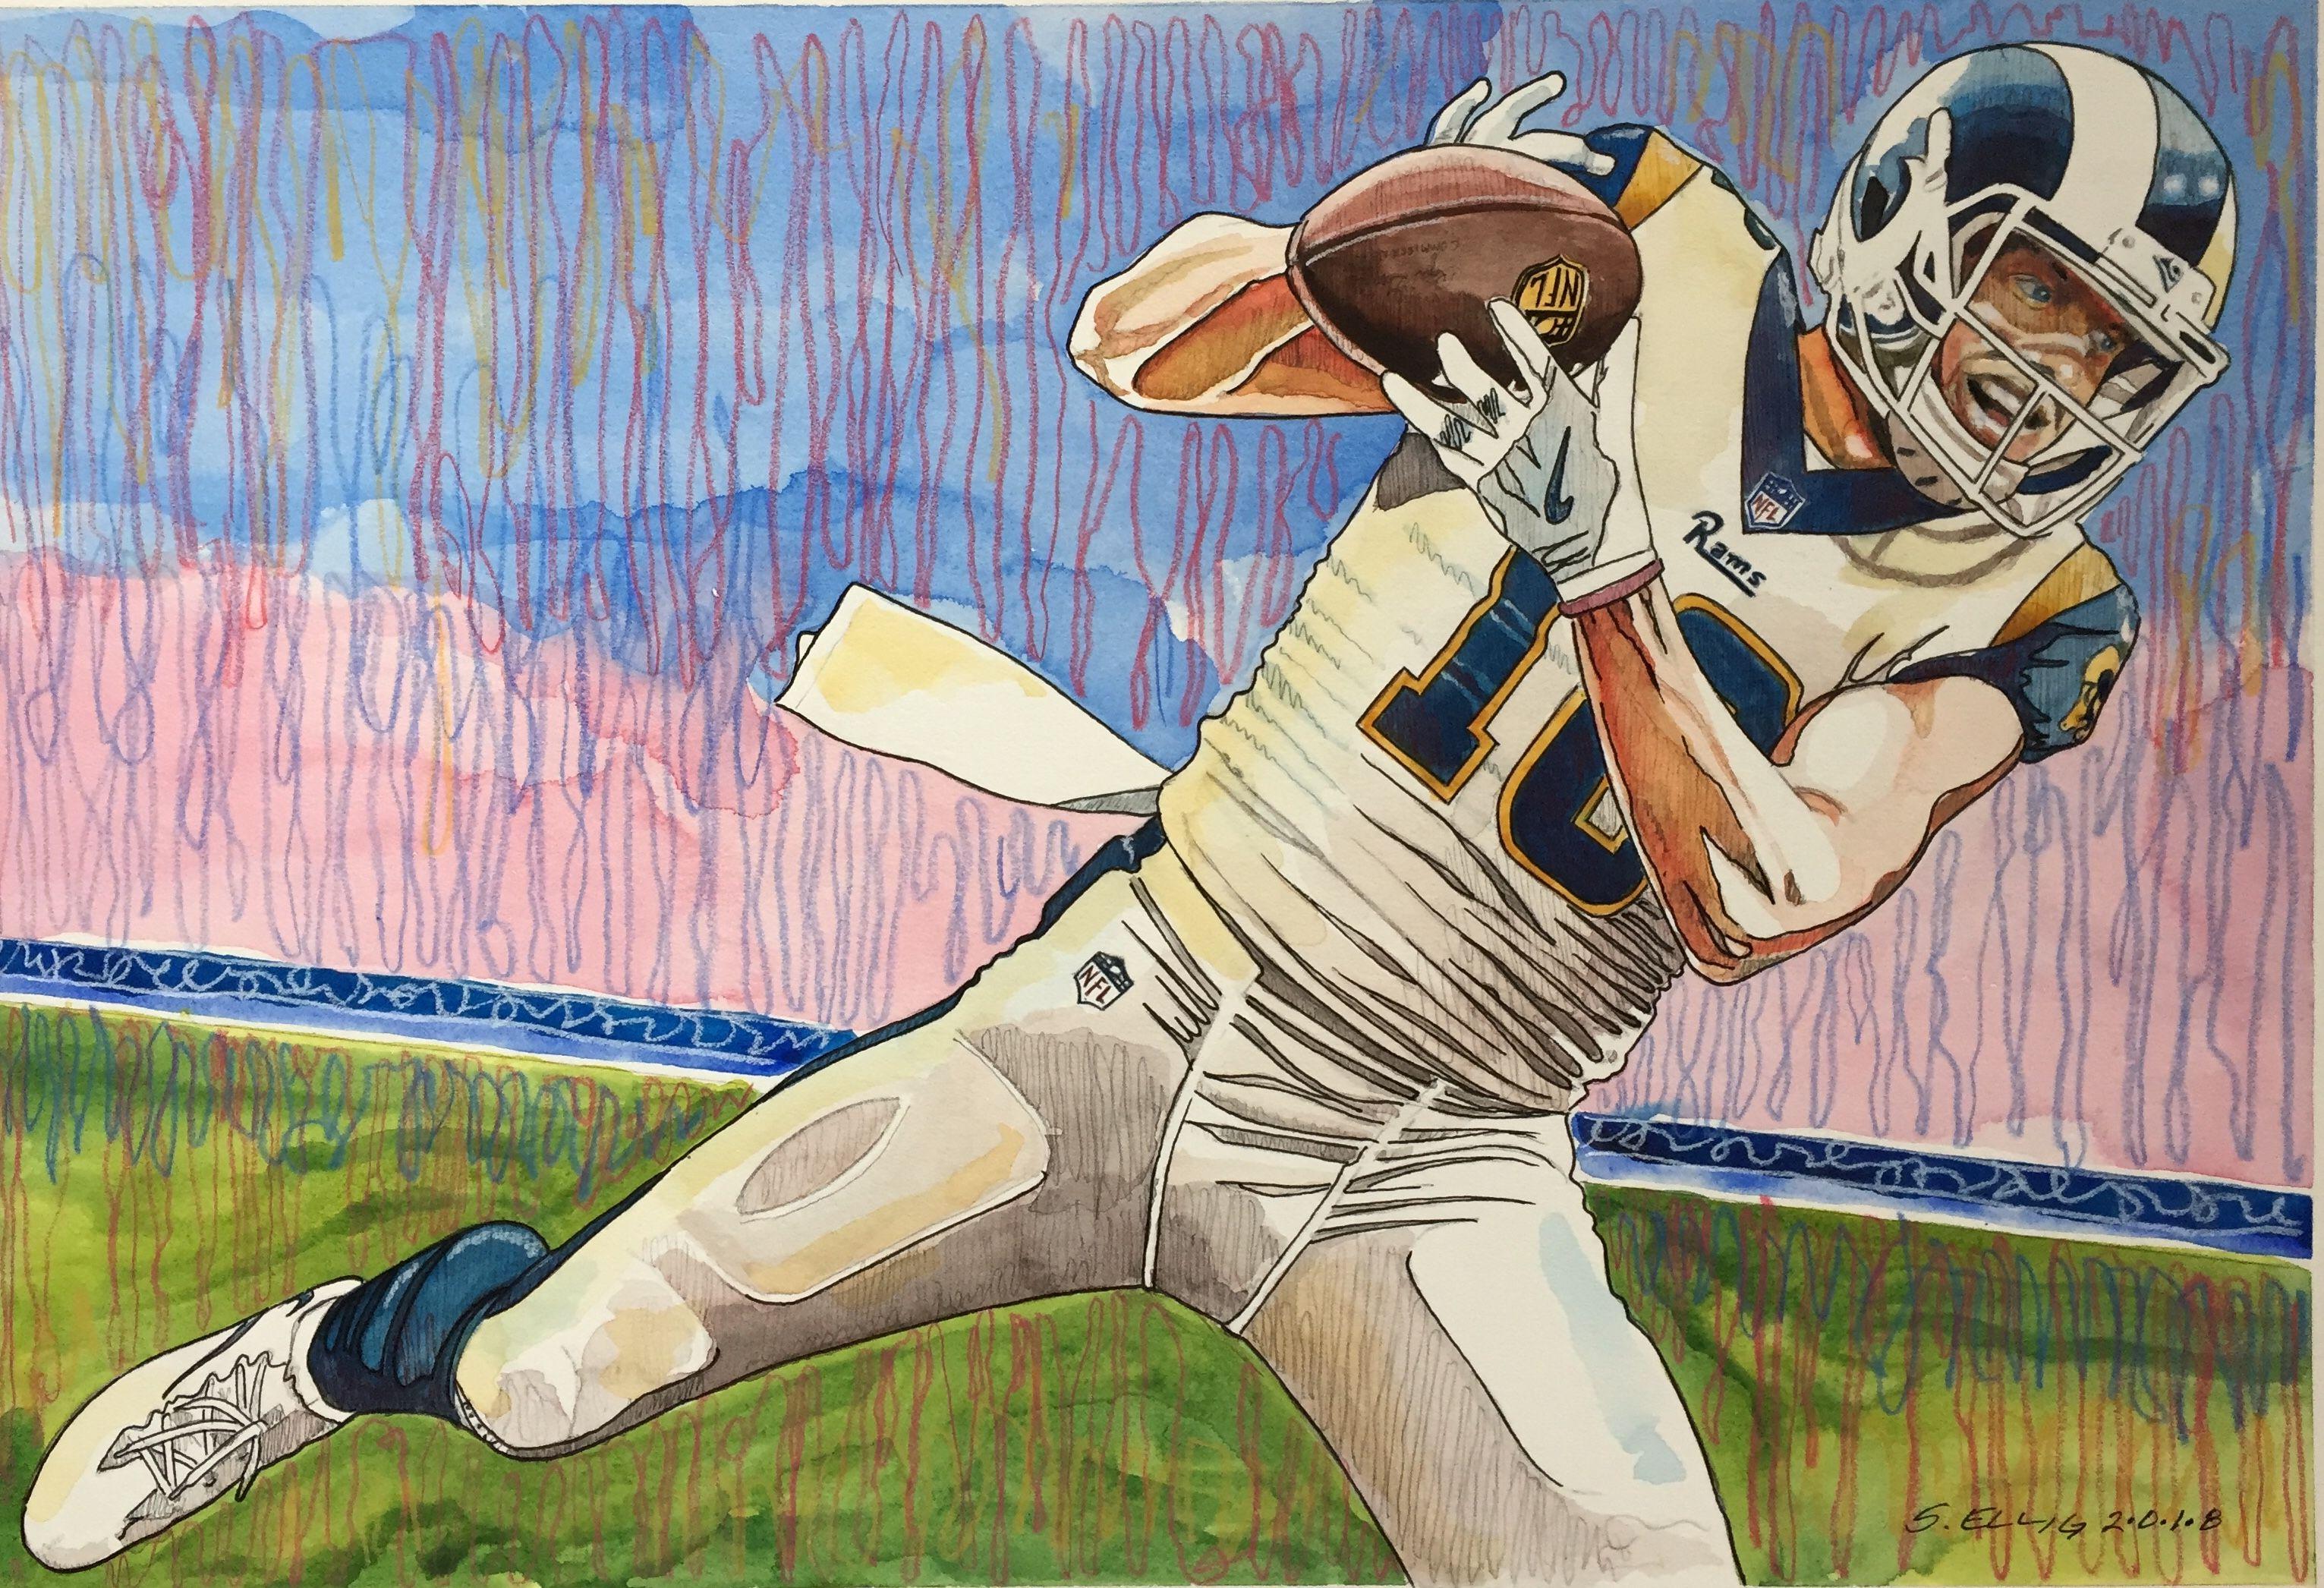 Cooper Kupp La Rams Mixed Media By Scott Ellig My Arts Character Art